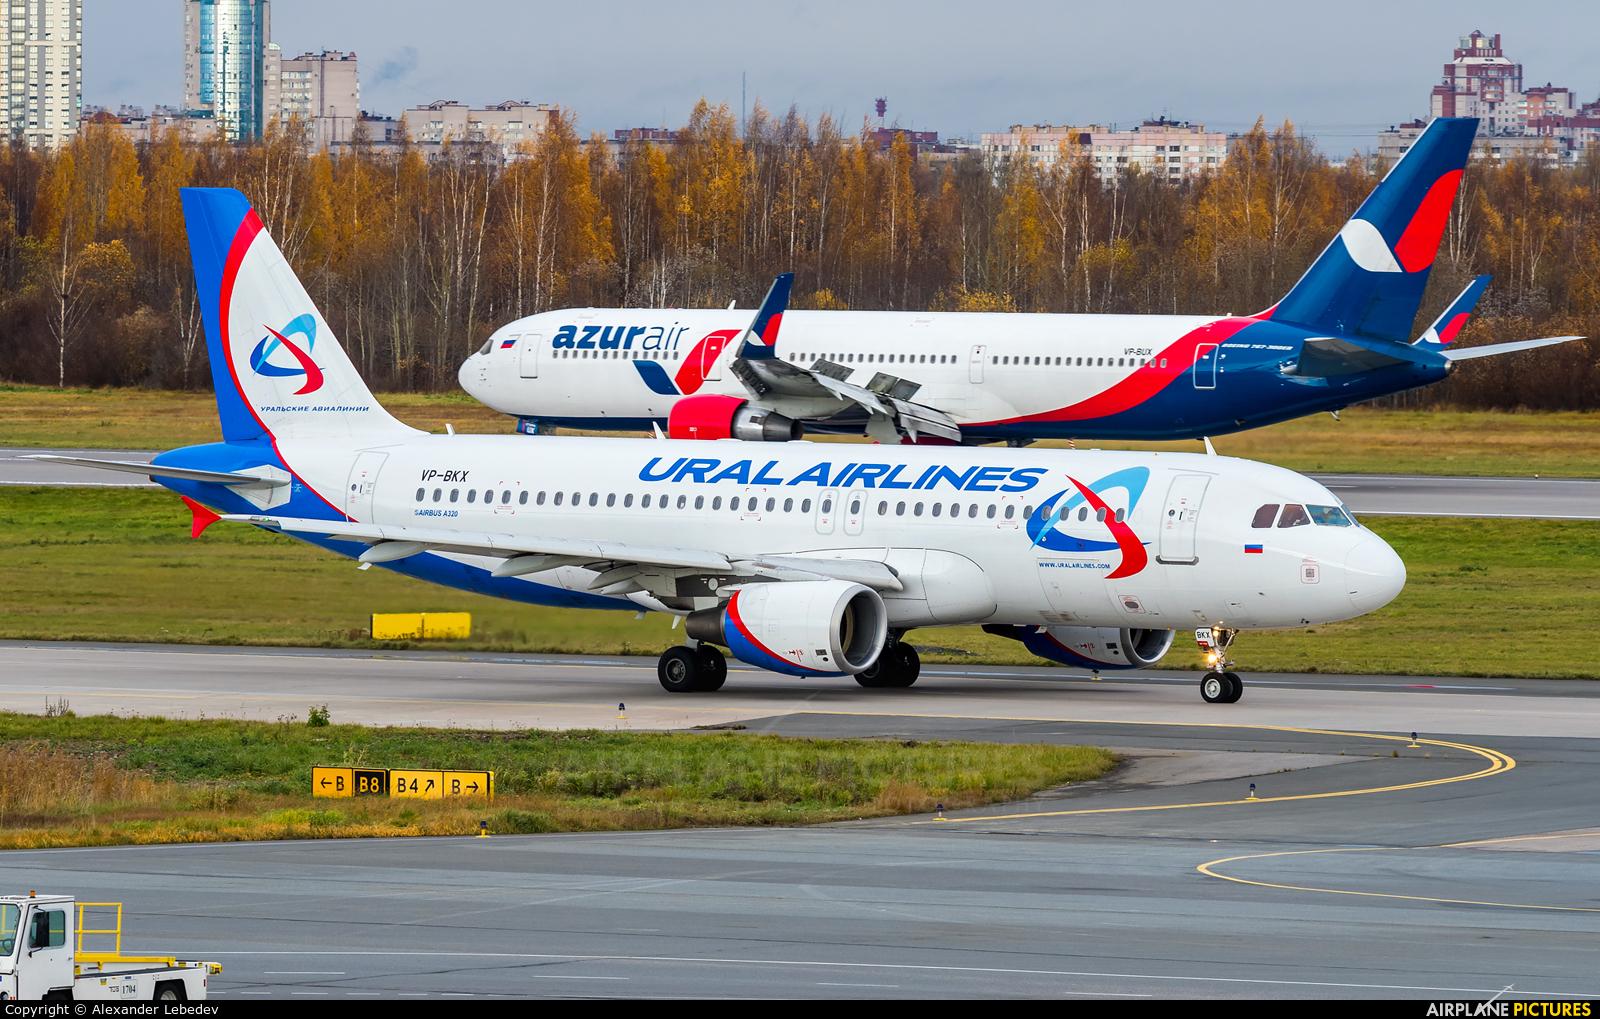 Ural Airlines VP-BKX aircraft at St. Petersburg - Pulkovo